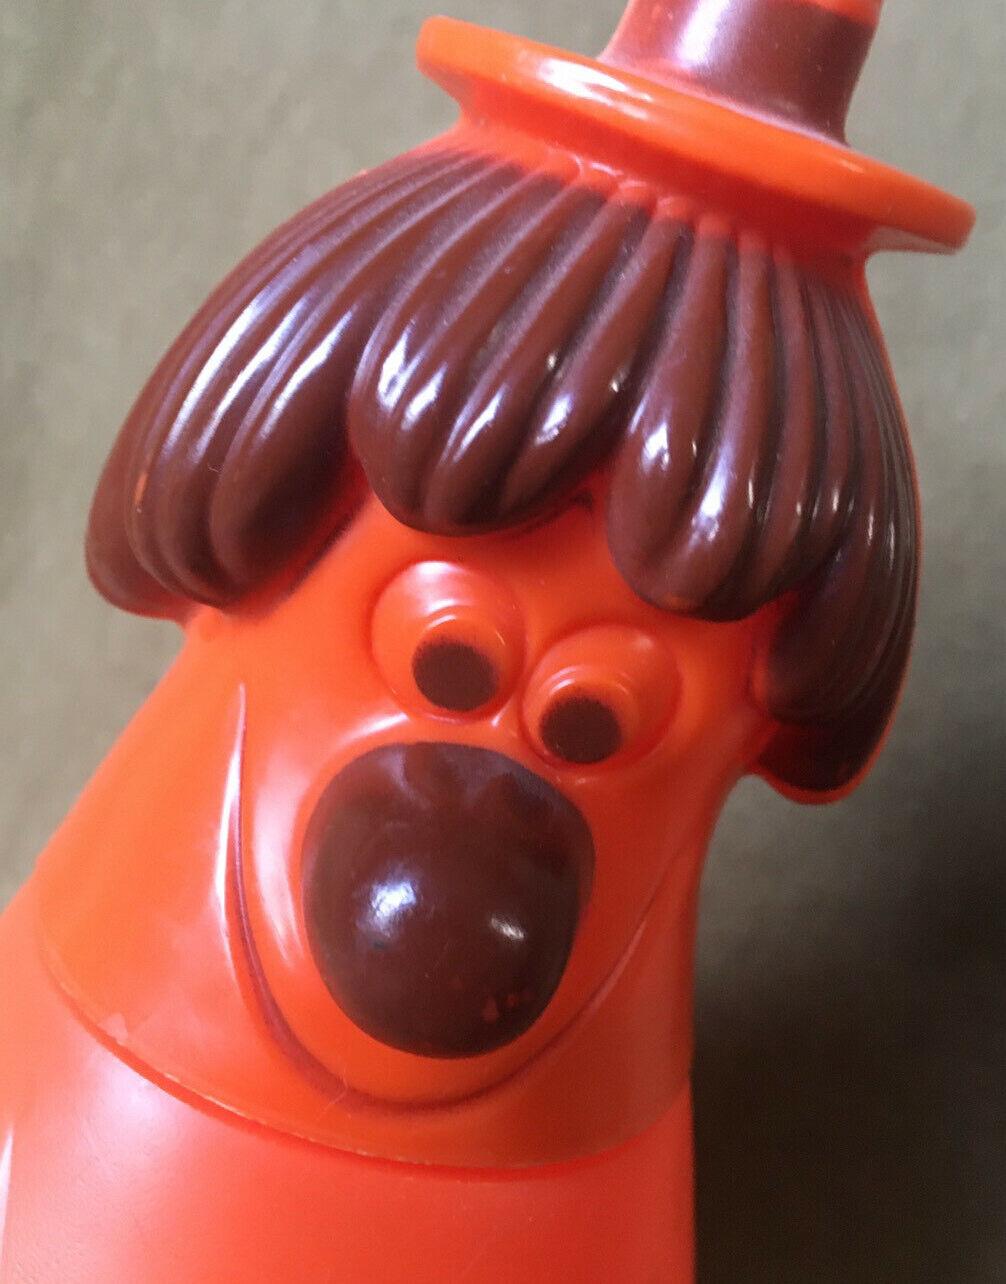 Vintage Puddin Head Shake-A-Pudding Jello Pudding AdGrünising Figure 1960's